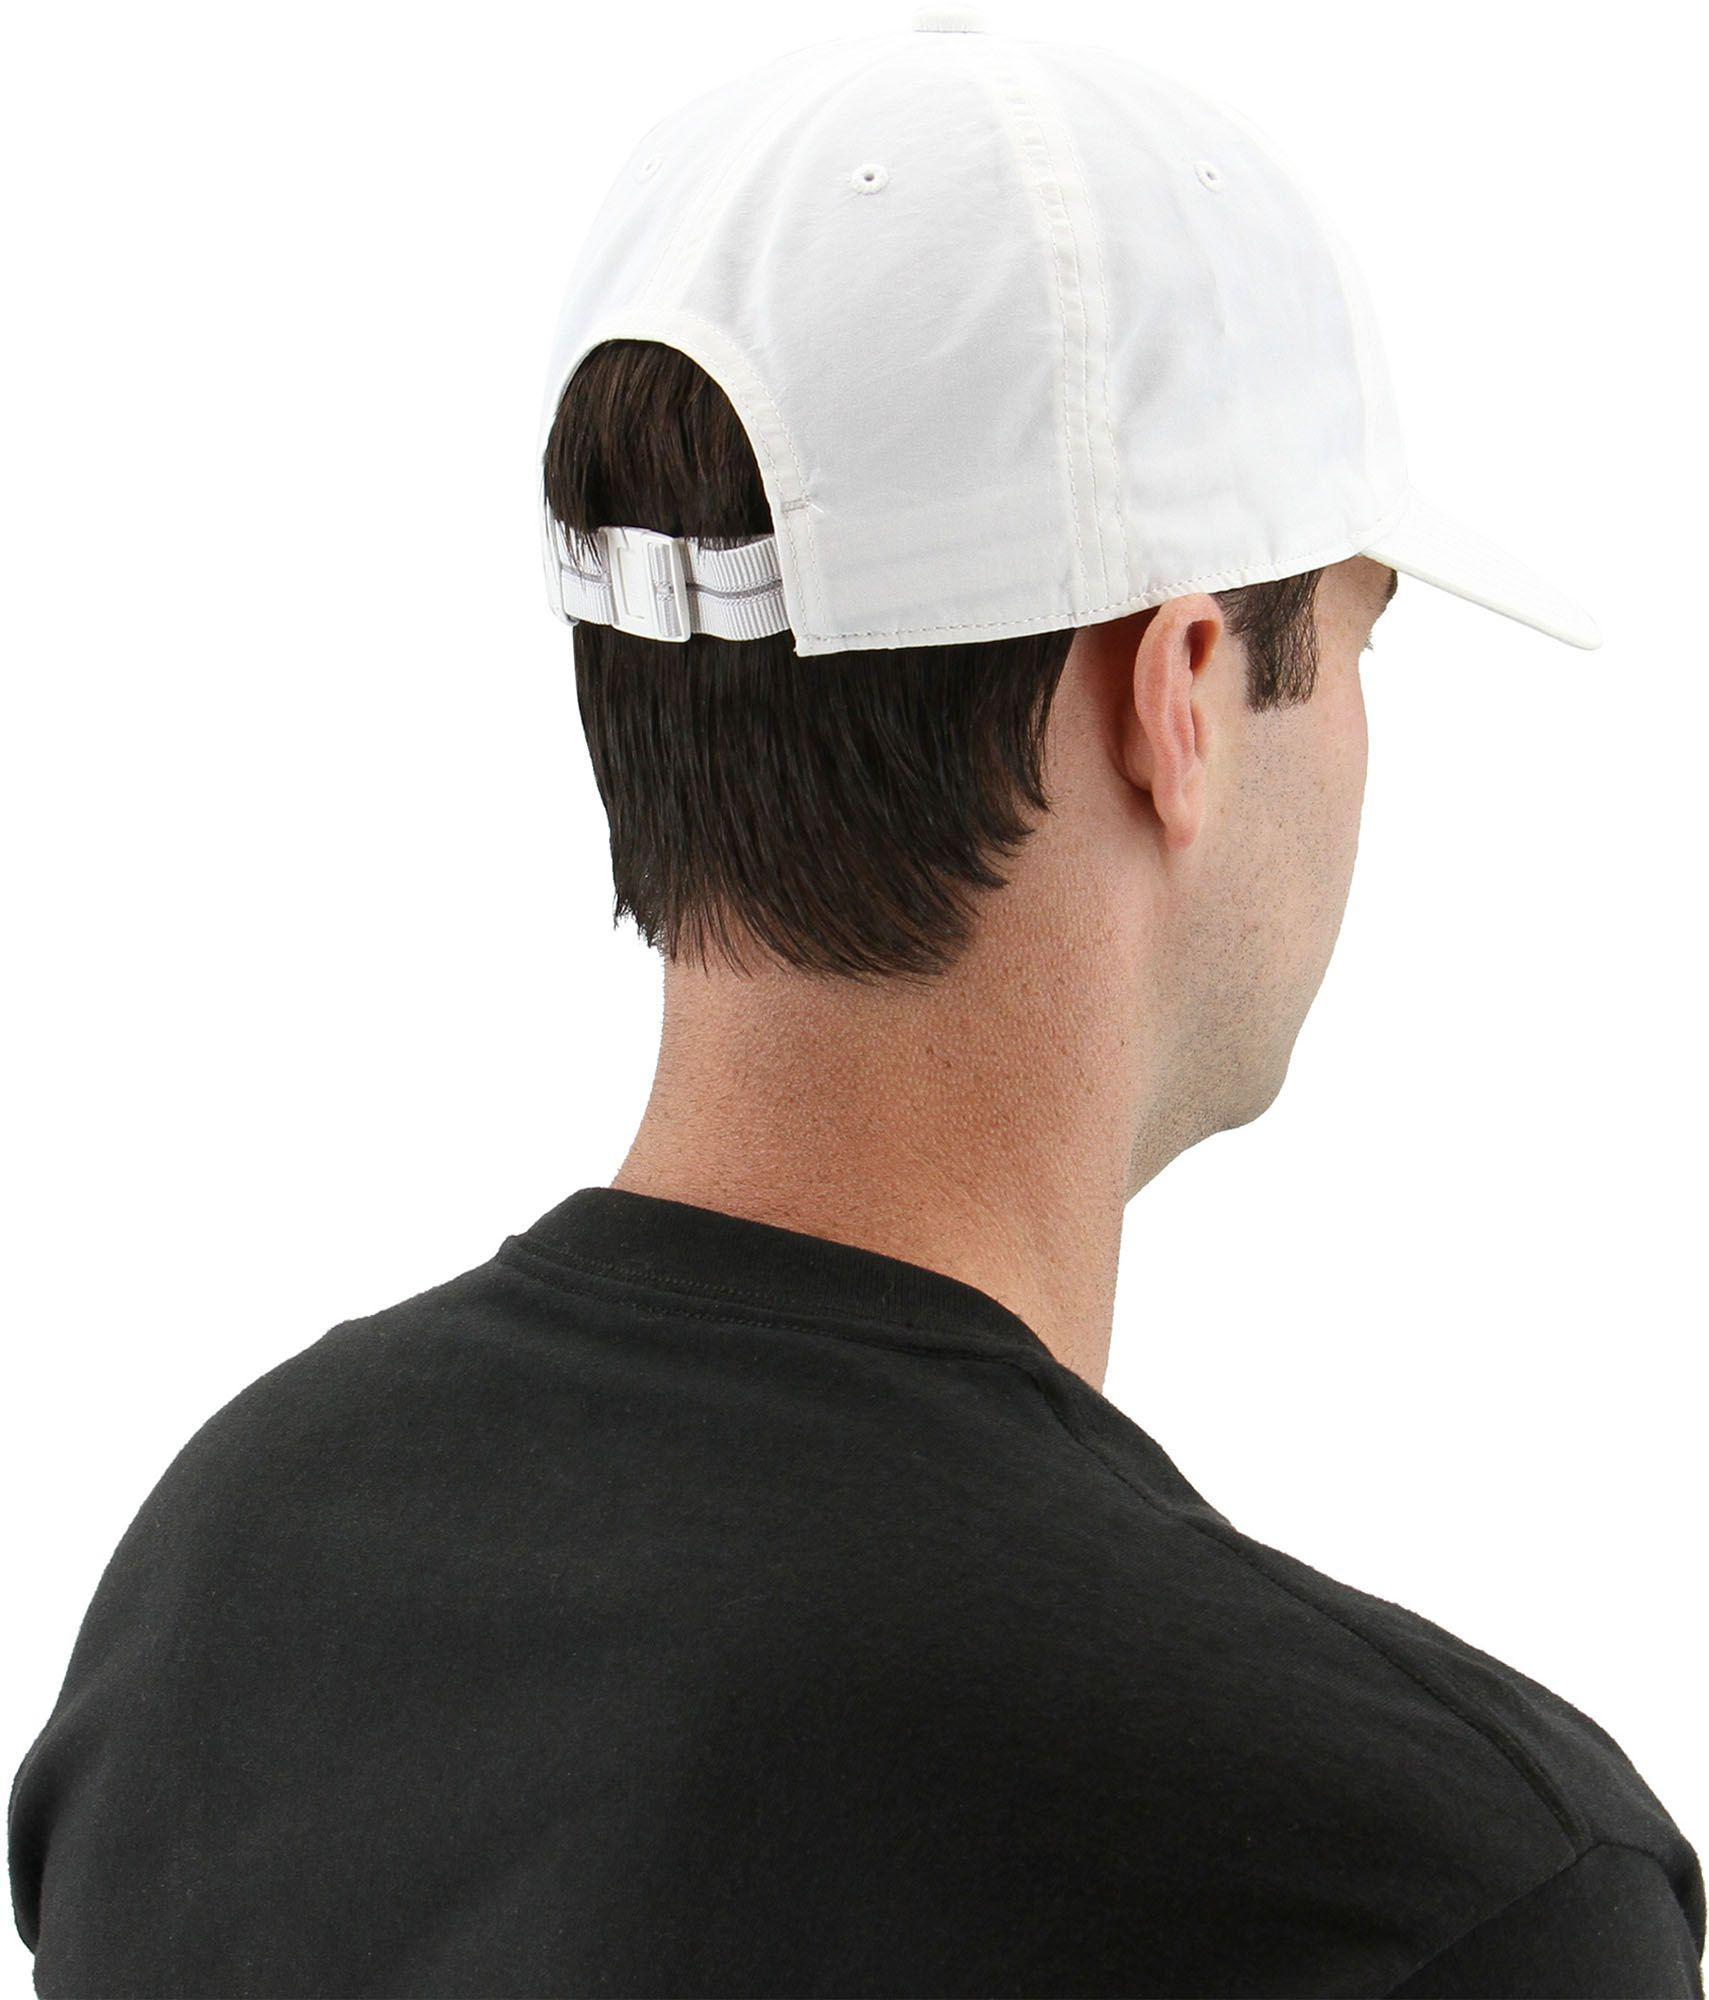 Adidas - White Originals Relaxed Modern Ii Hat for Men - Lyst. View  fullscreen 09c2001c6e8